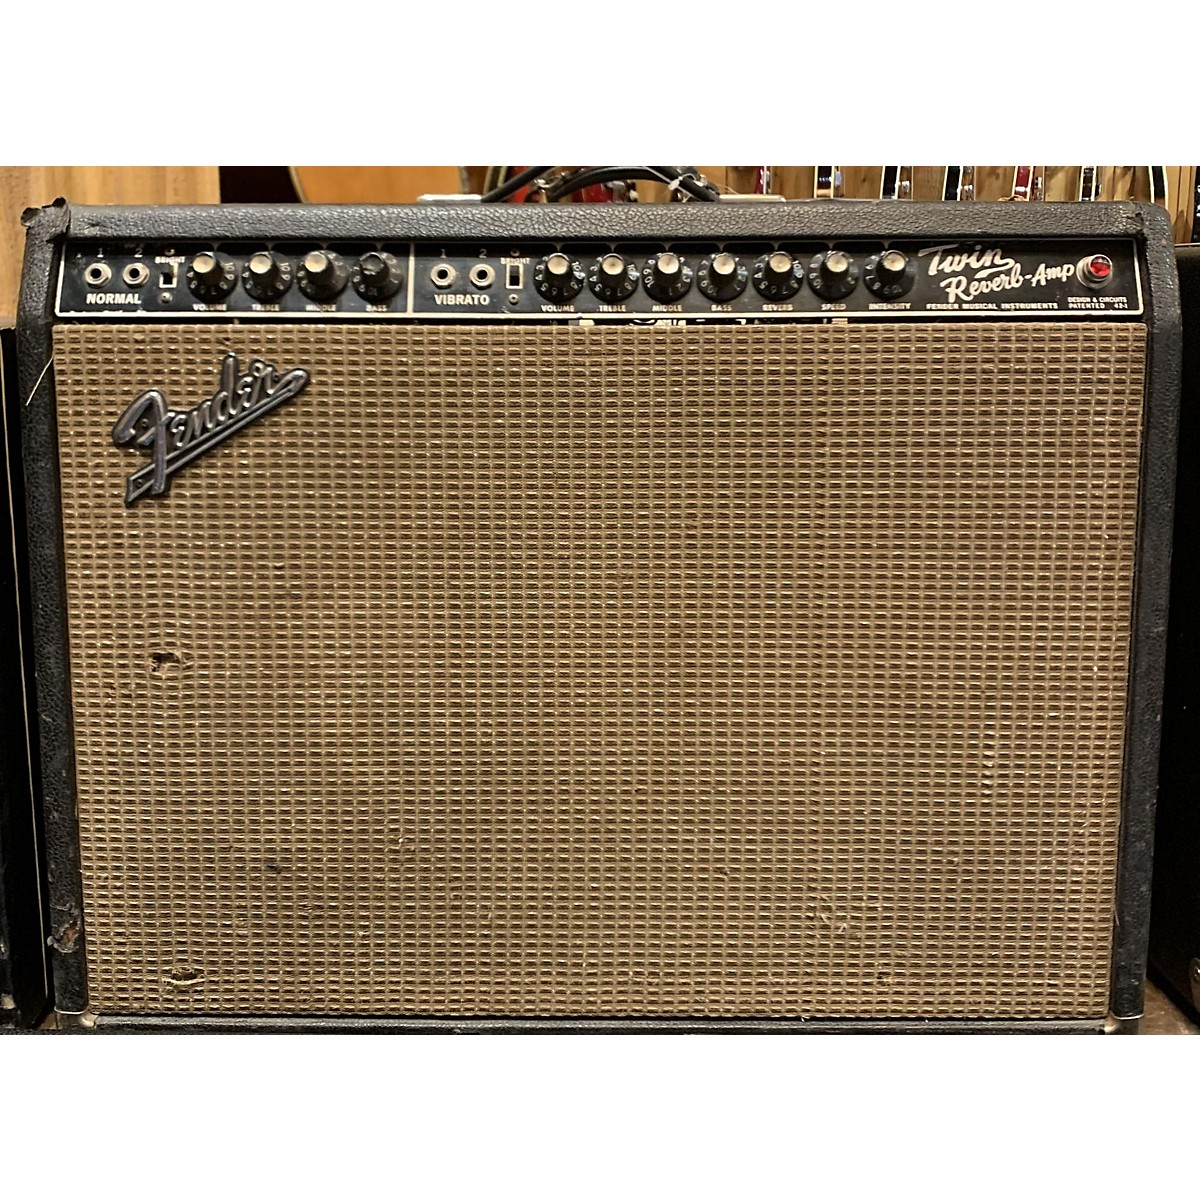 Fender 1965 Twin Reverb 2x12 Tube Guitar Combo Amp